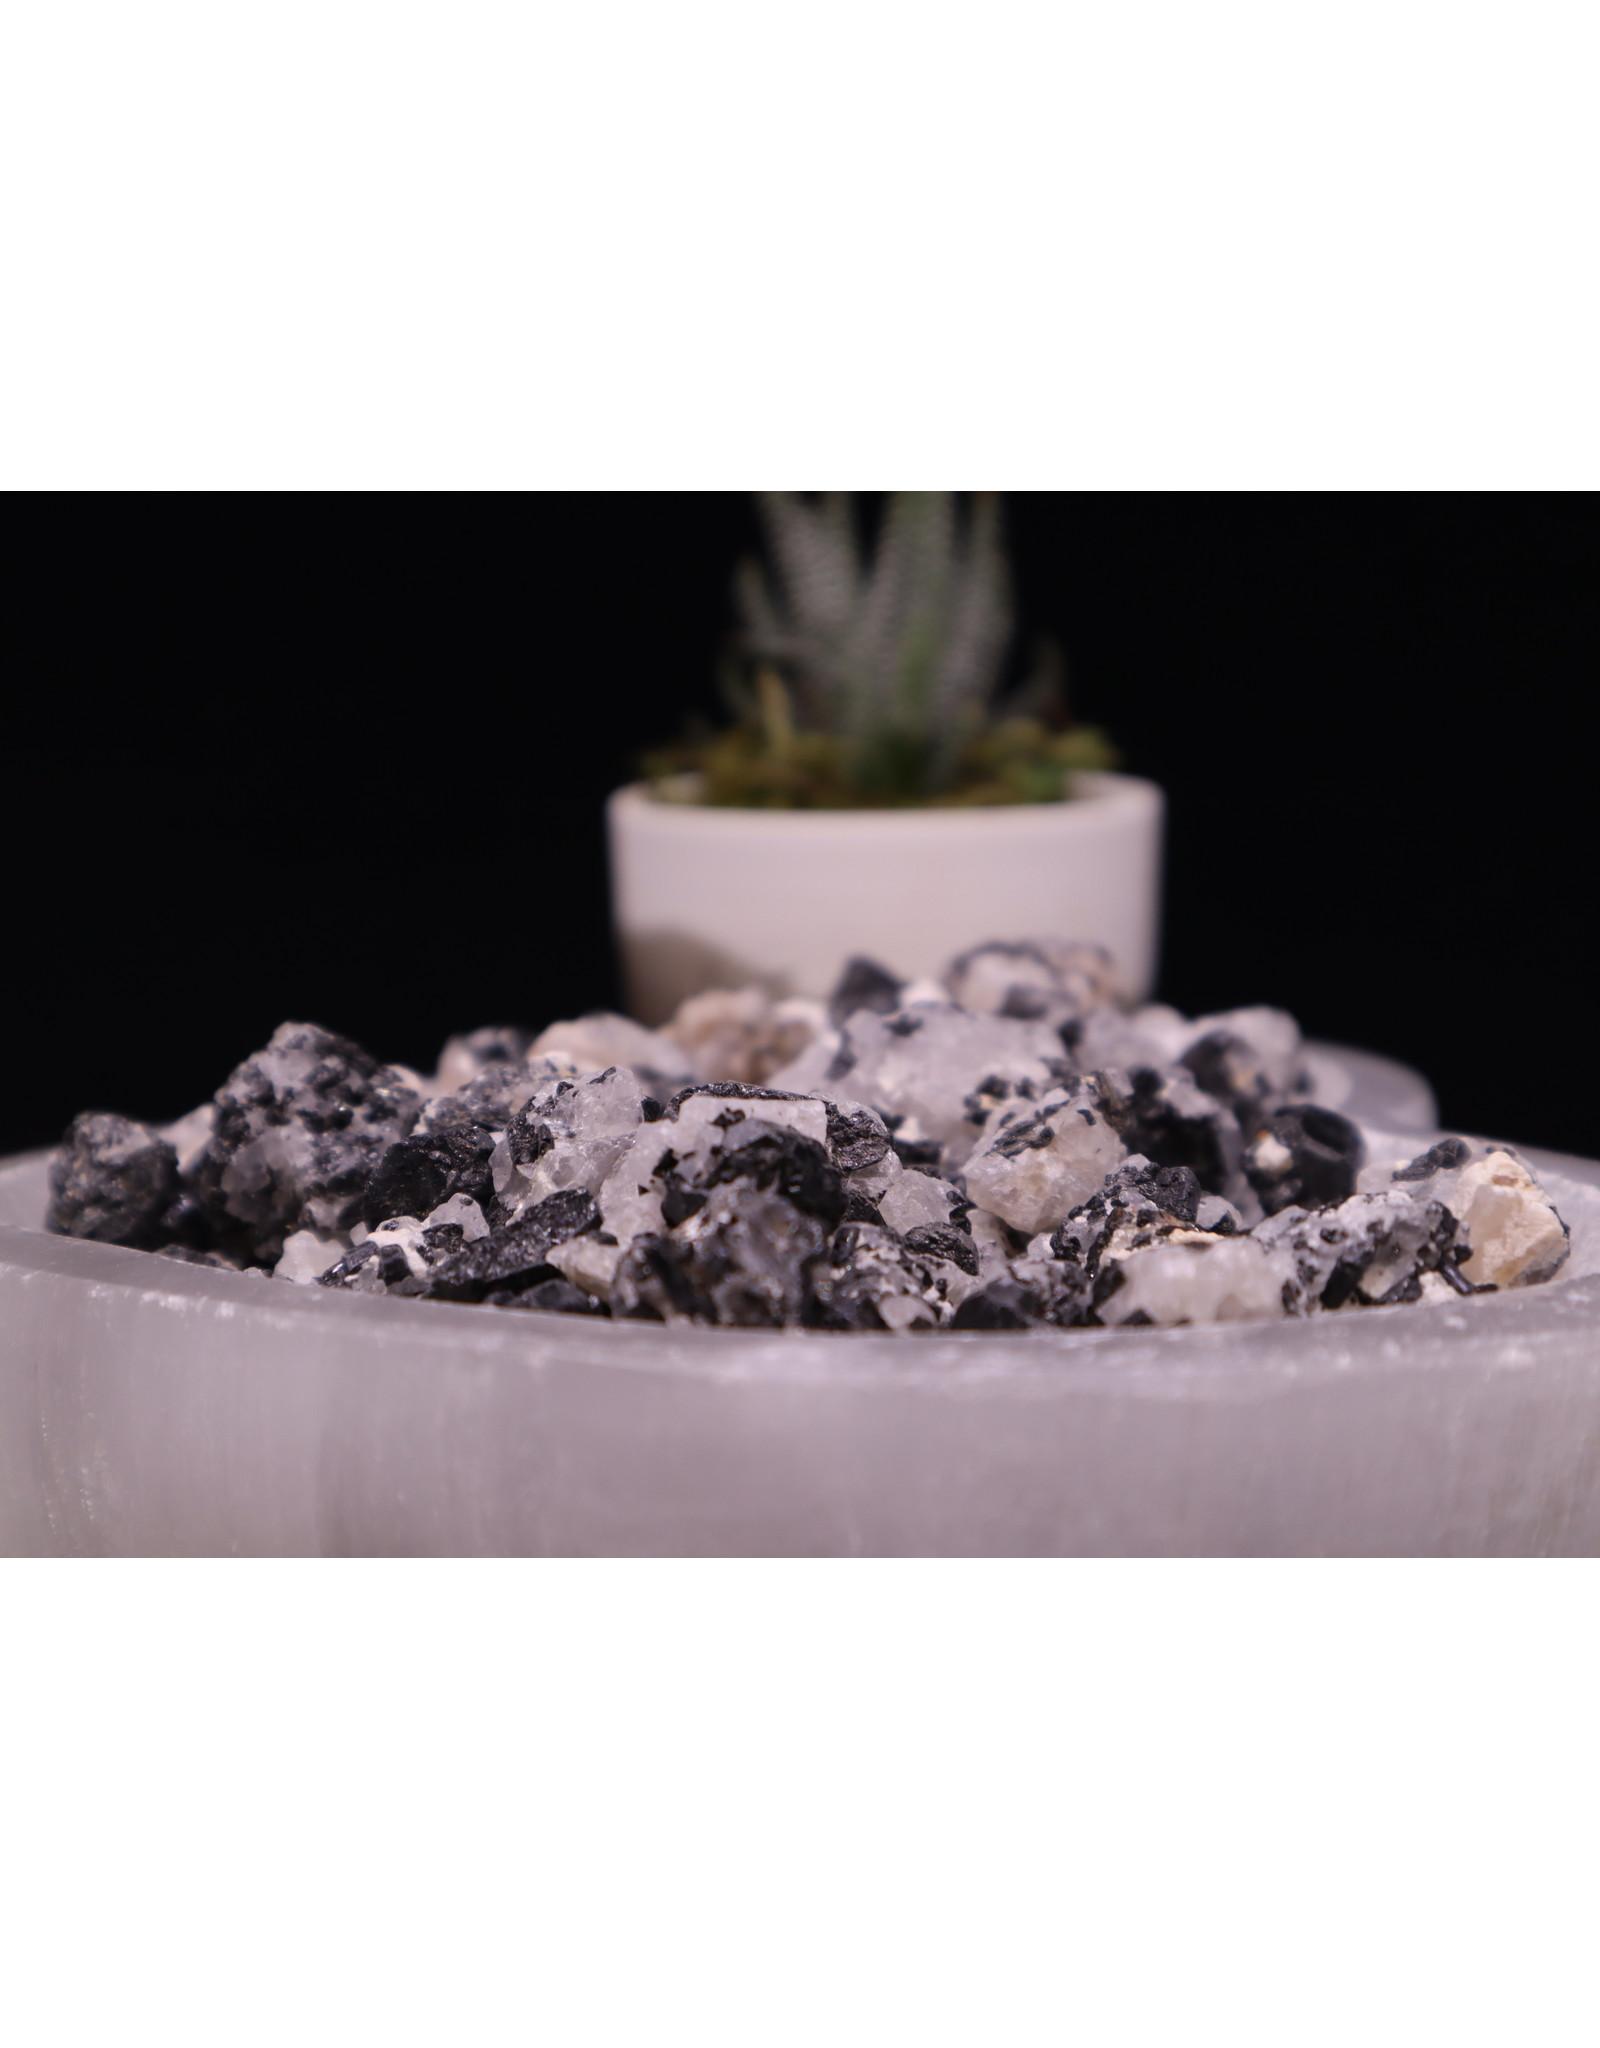 Black Tourmaline (Tourmalated) on Quartz - Rough Raw Natural